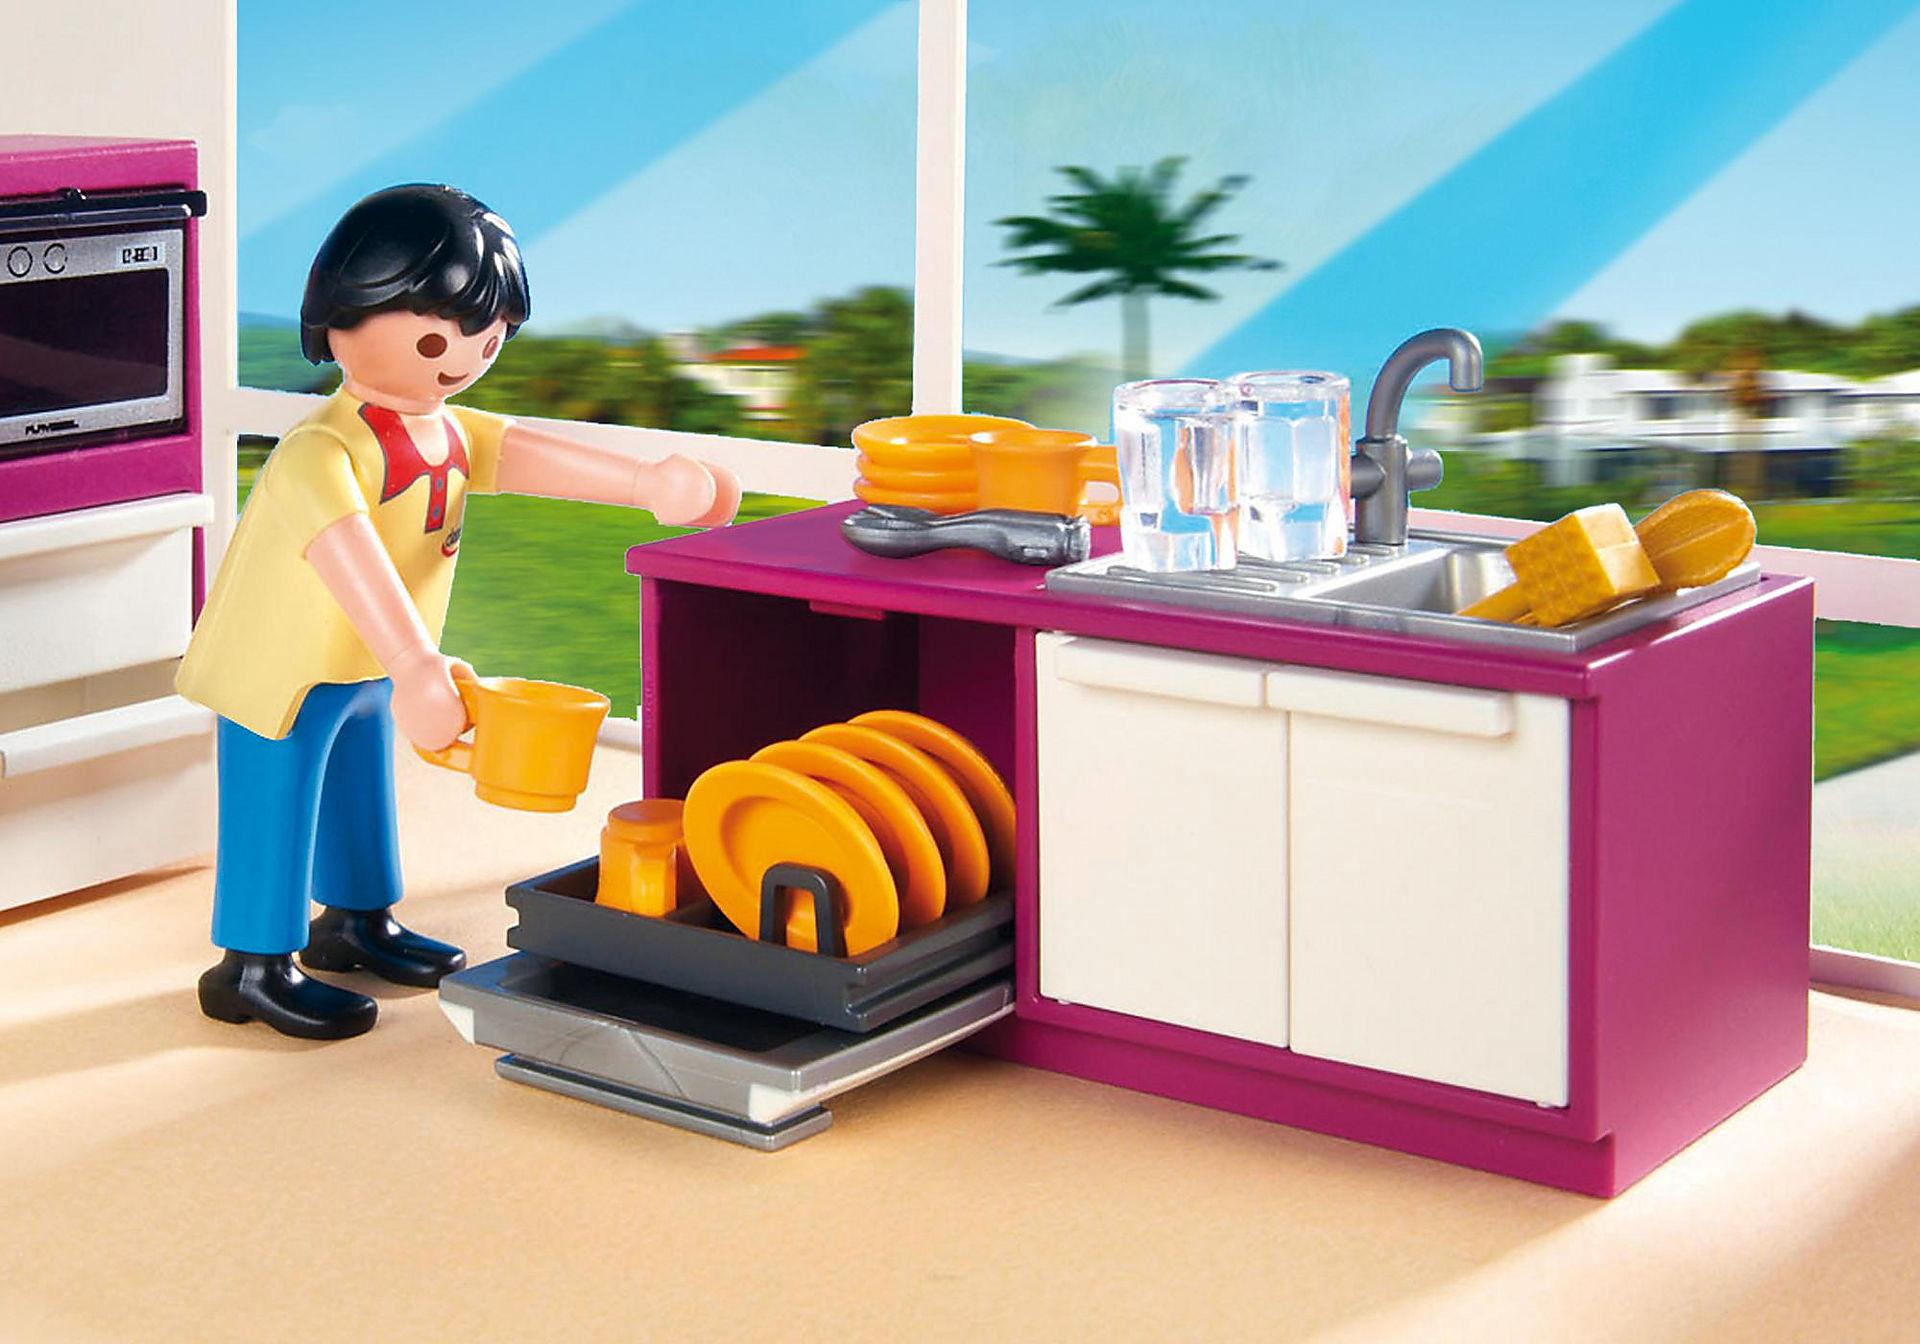 http://media.playmobil.com/i/playmobil/5582_product_extra2/Keuken met kookeiland